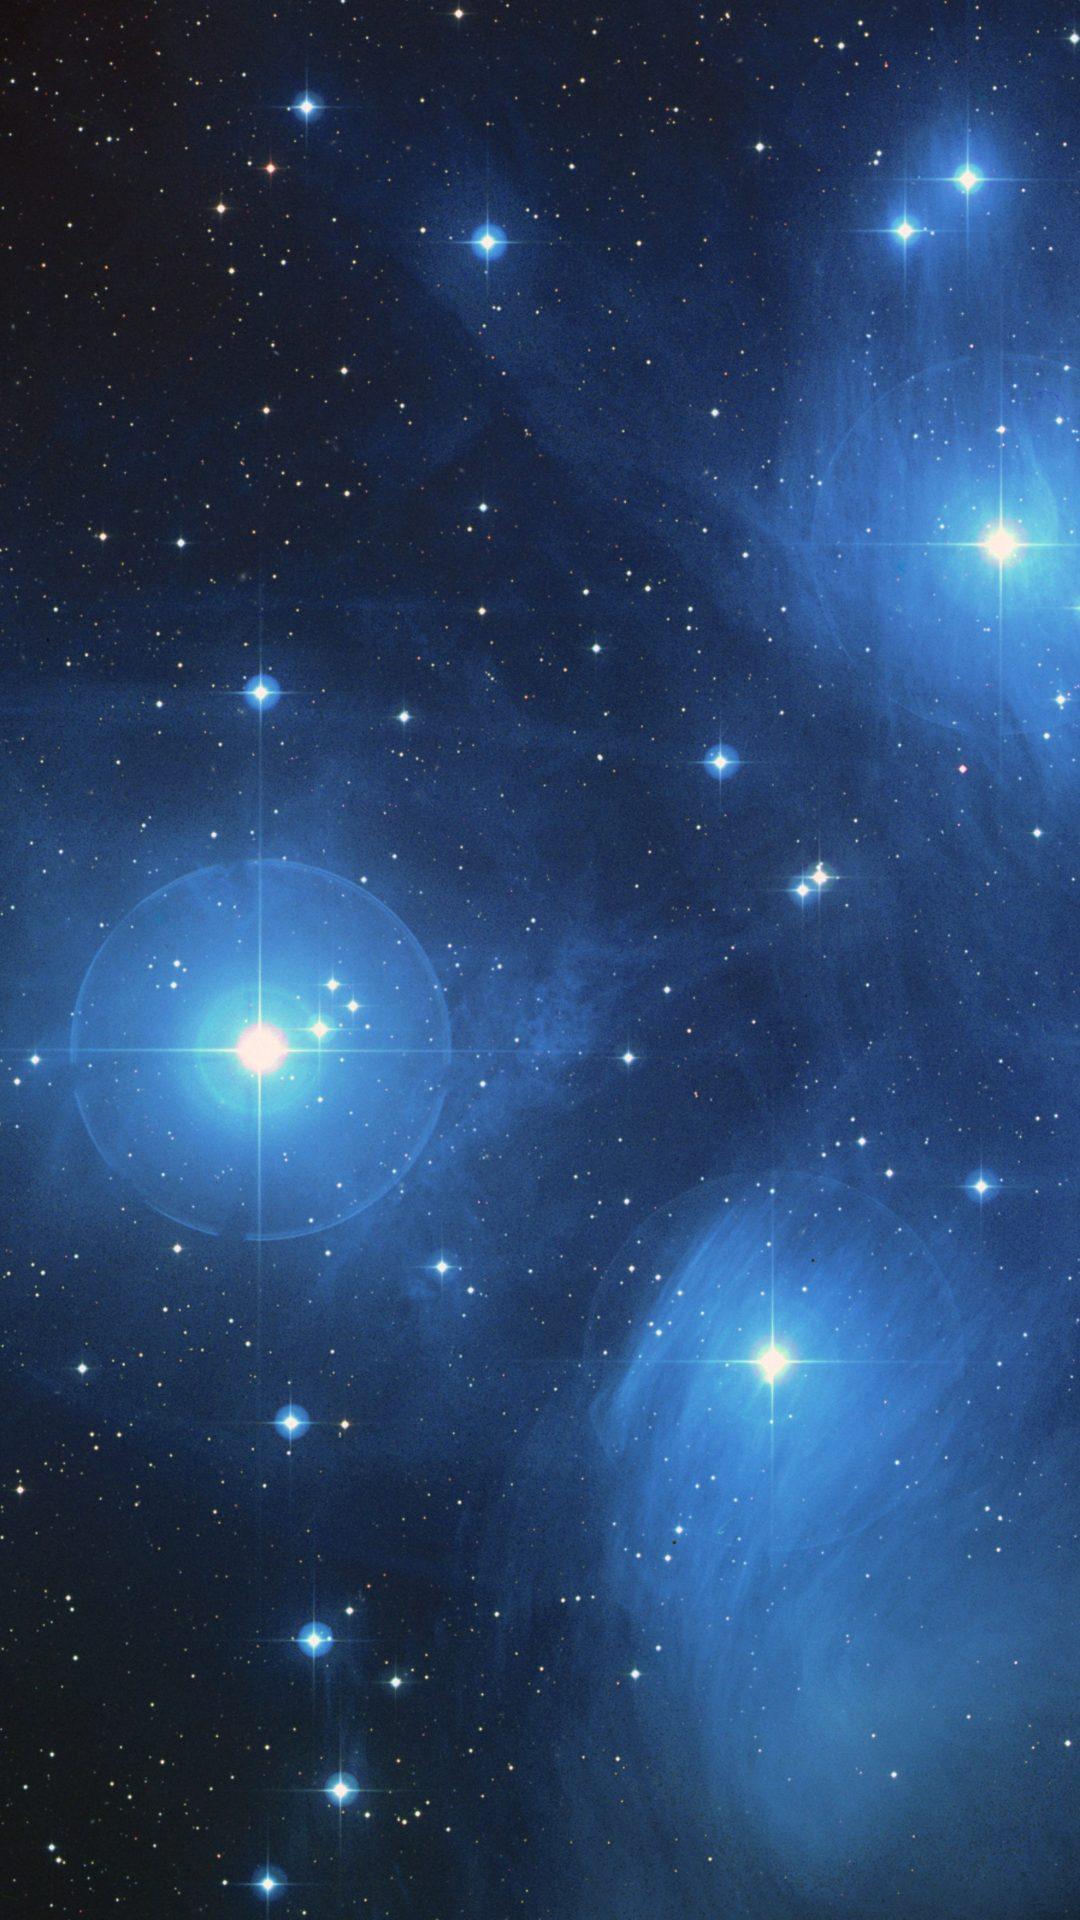 Iphone X Wallpaper Hd Original The Pleiades Open Star Cluster 4k Uhd Wallpaper